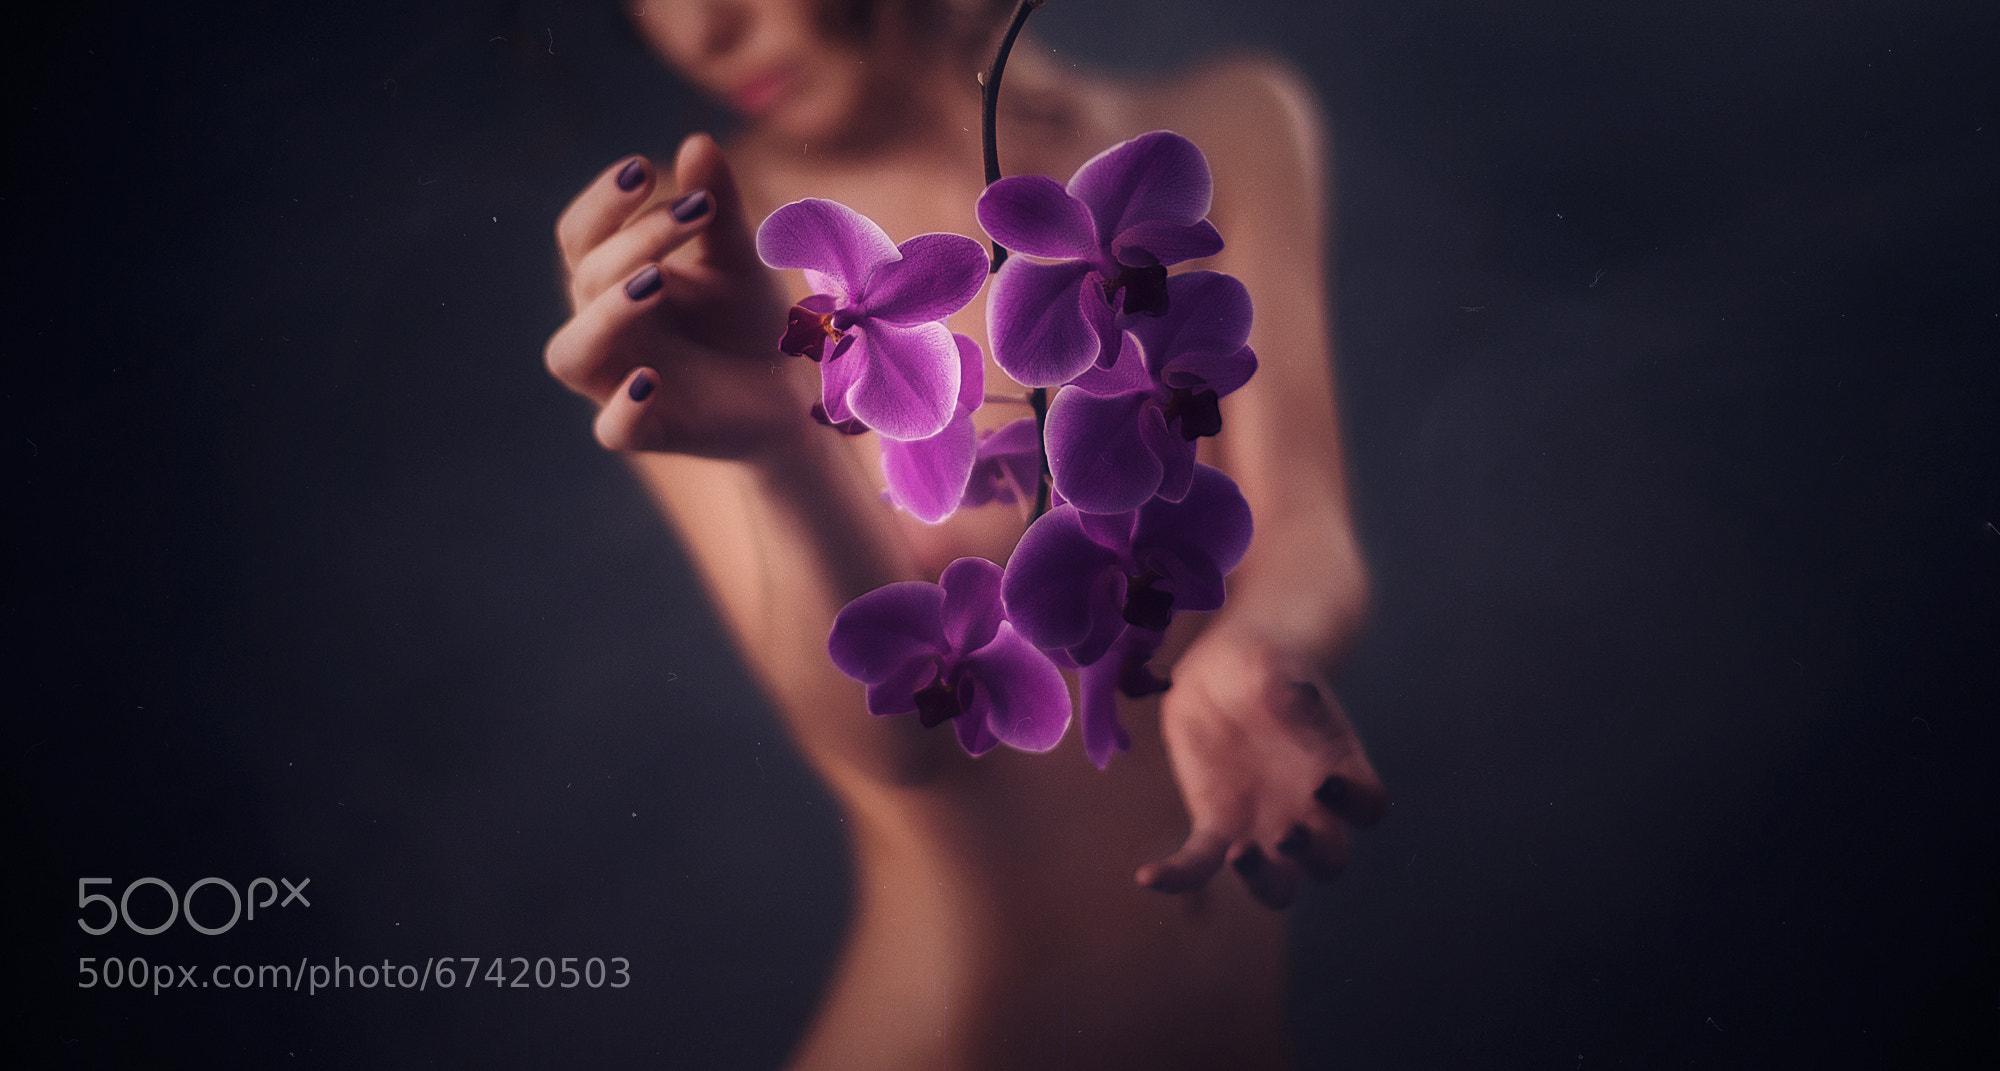 Photograph Orchid by Kirill Chernyavsky on 500px